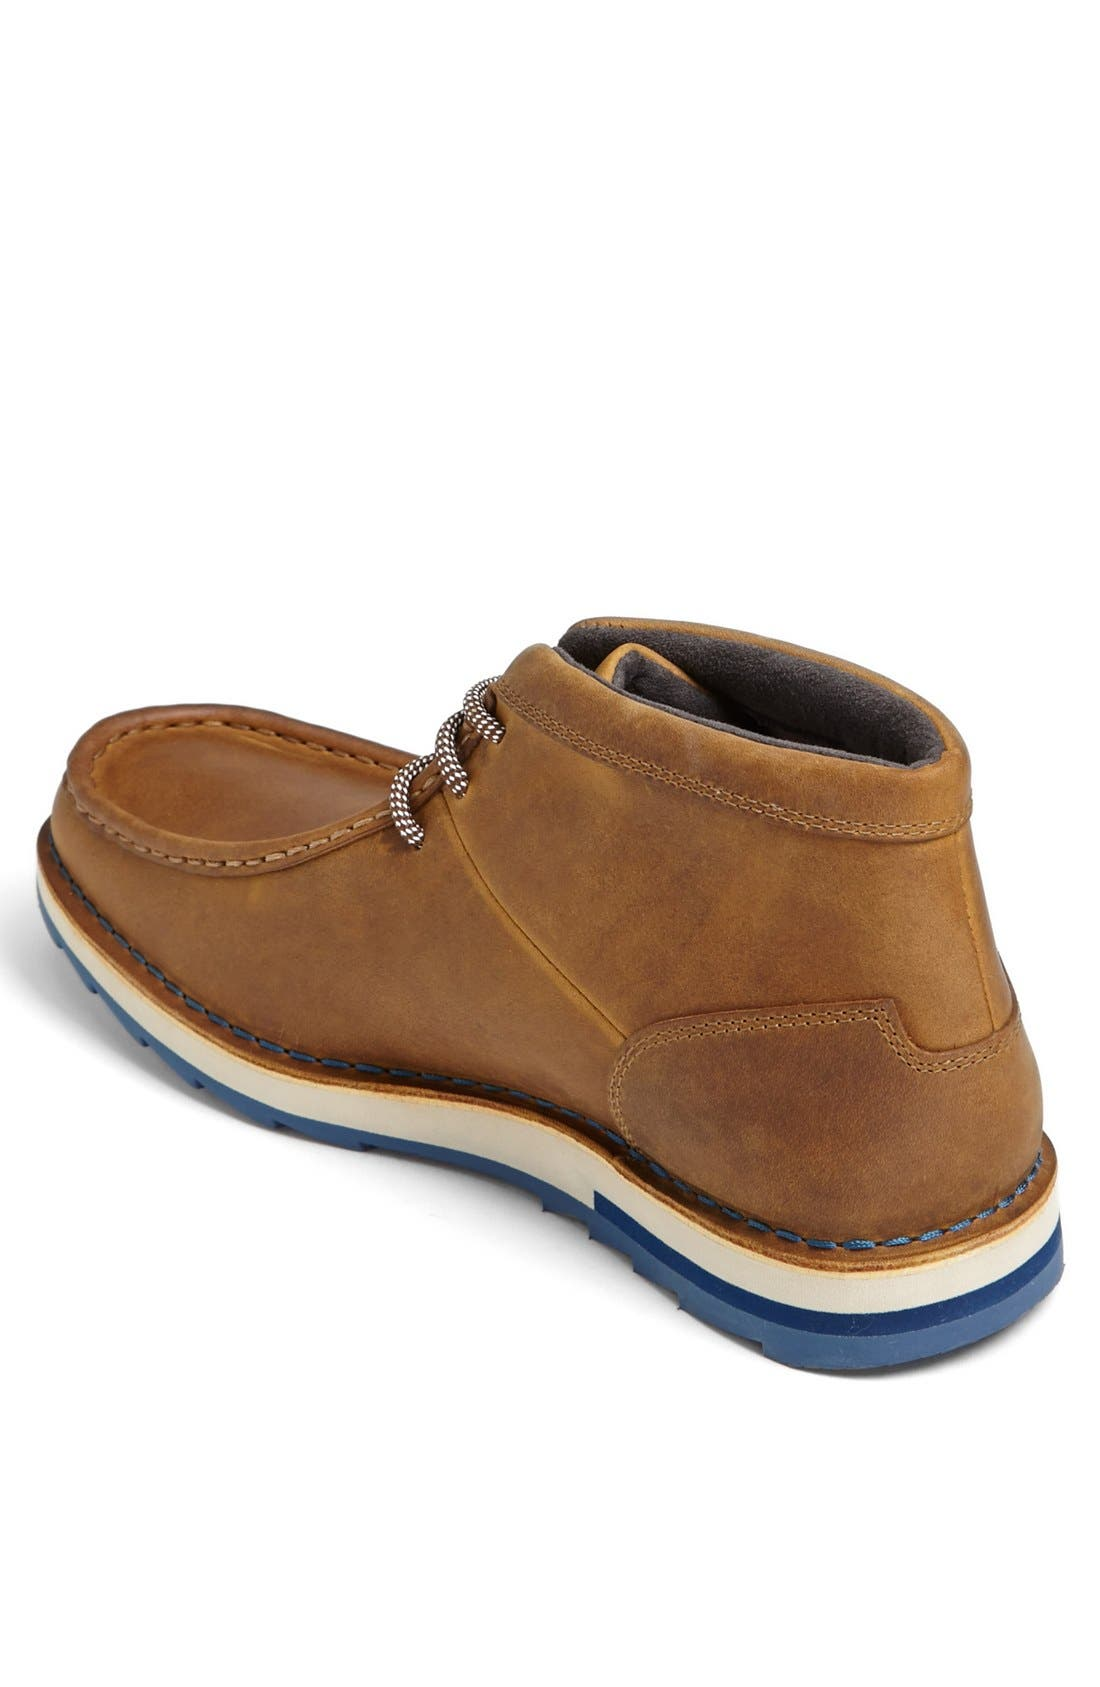 Alternate Image 2  - Clarks® 'Folk' Moc Toe Chukka Boot